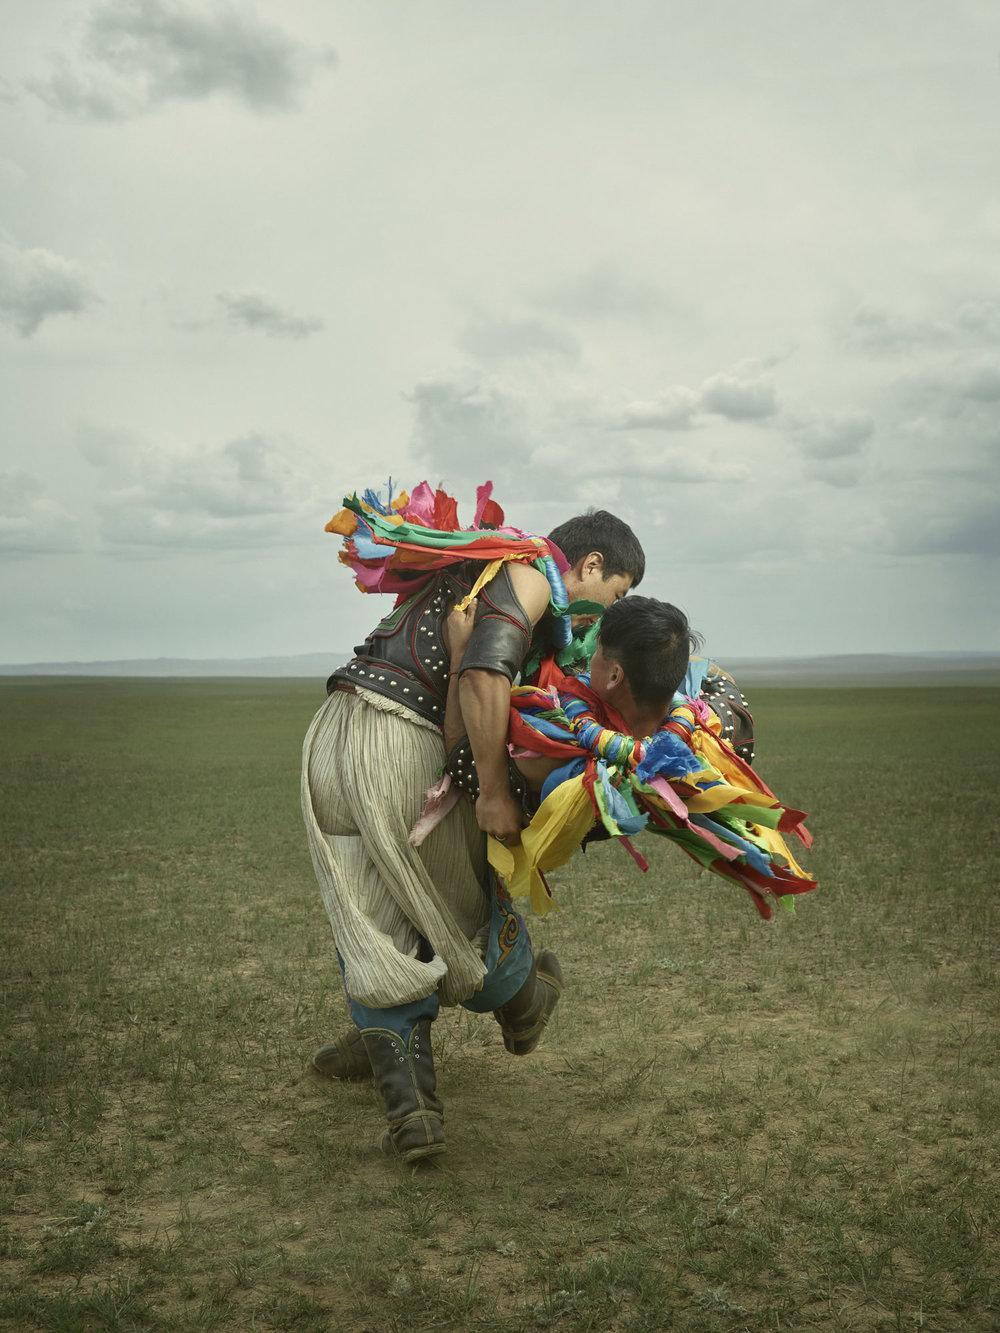 ken-hermann-bokh-2016-photography-of-china-4.jpg